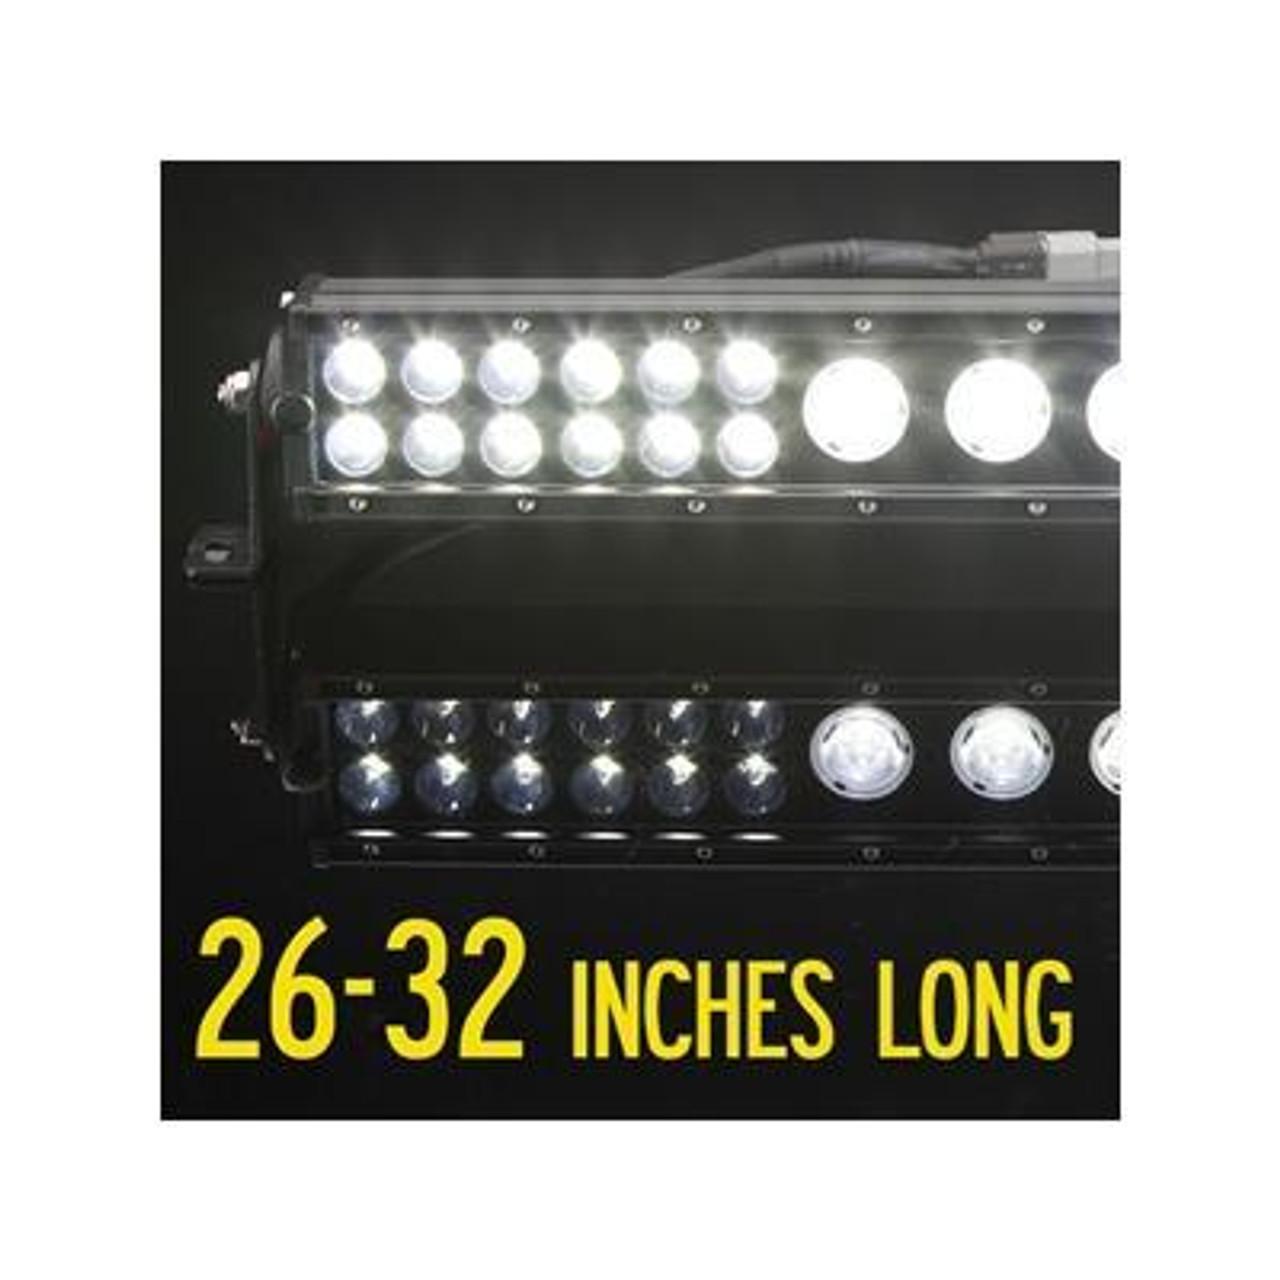 26 32 Inch Long Led Light Bar Selection